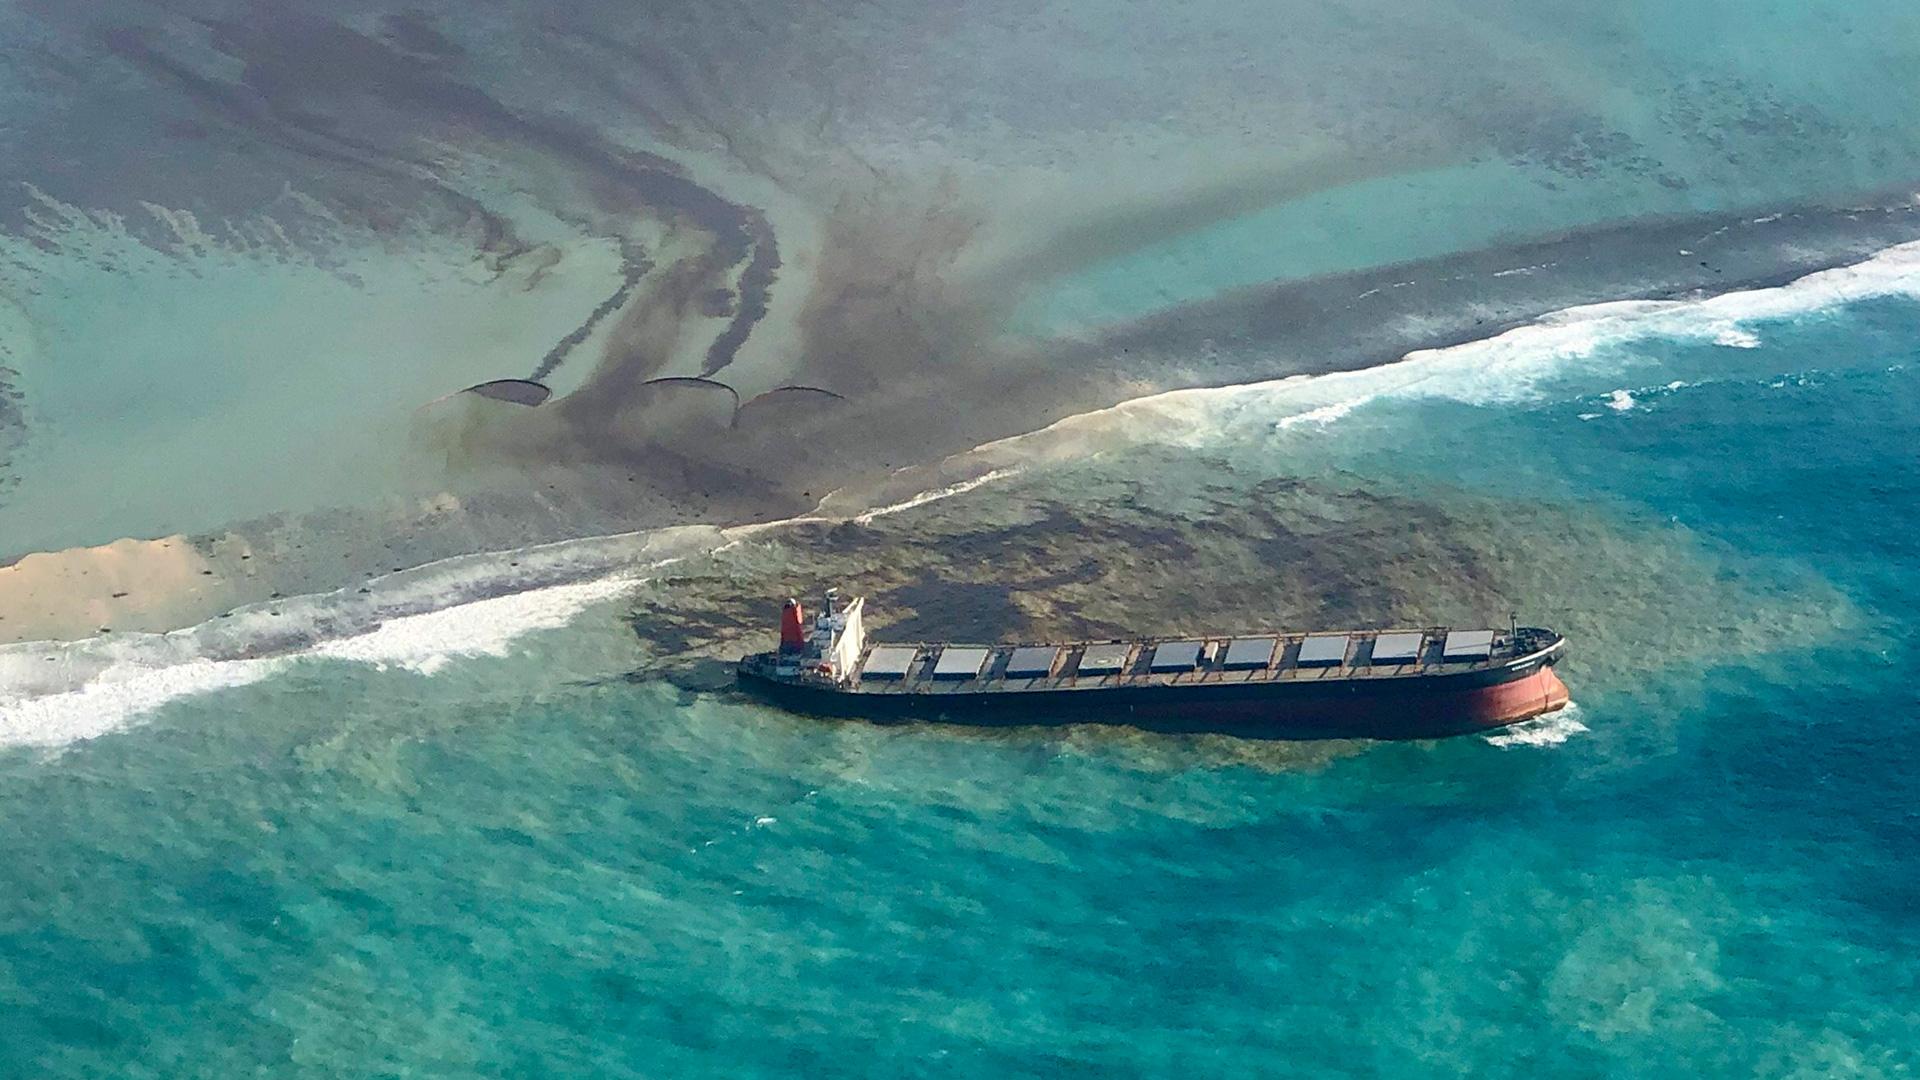 Ölkatastrophe vor Mauritius im Juli 2020